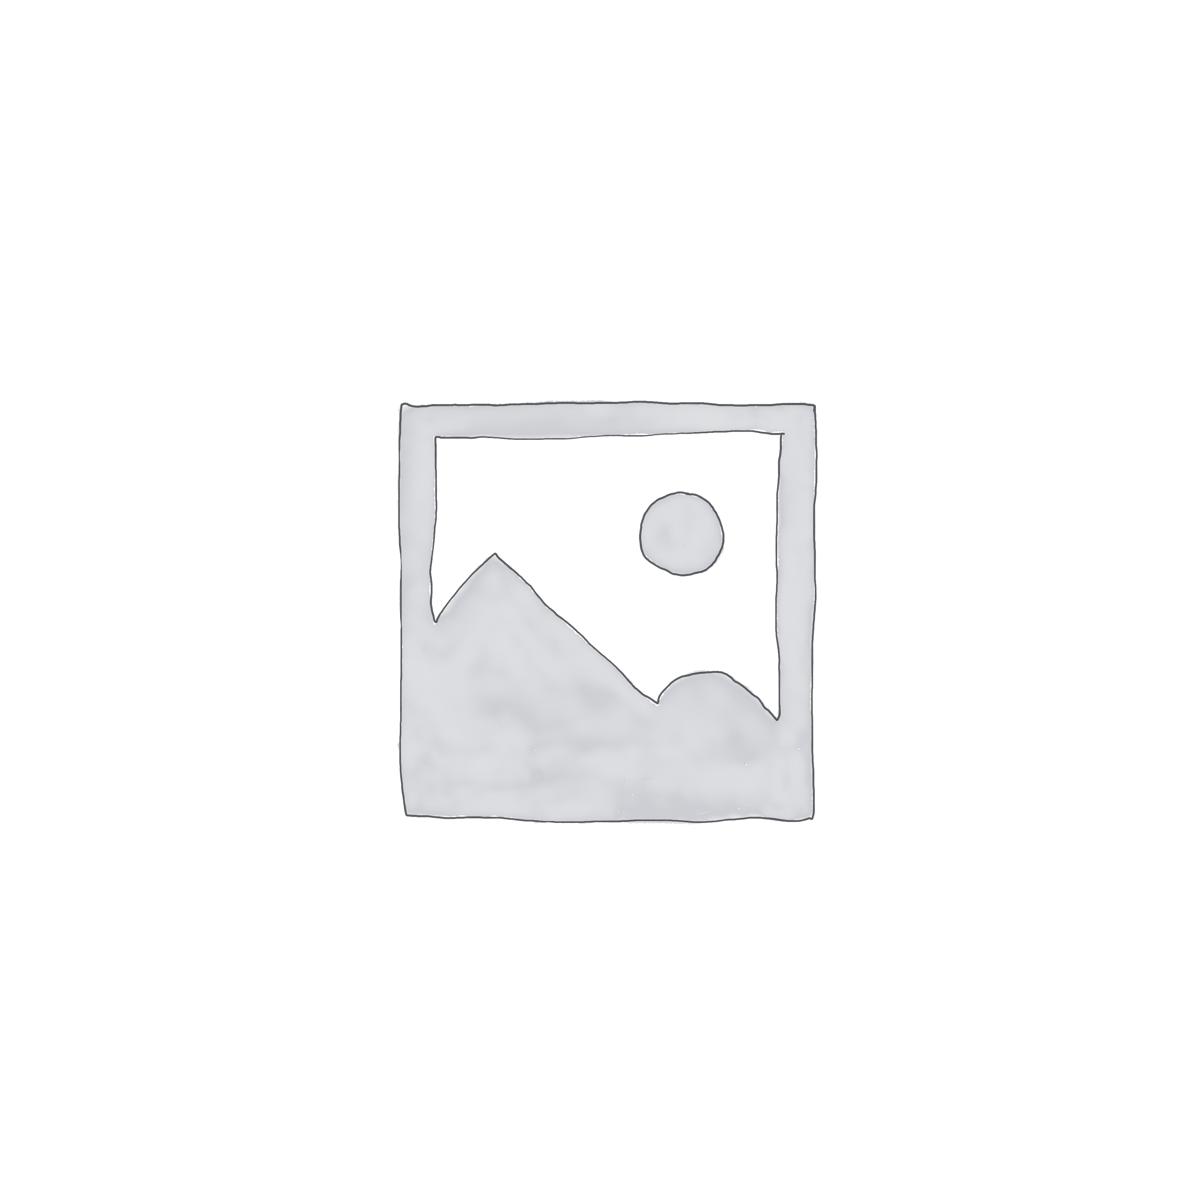 Danfoss Icon Zoneregeling